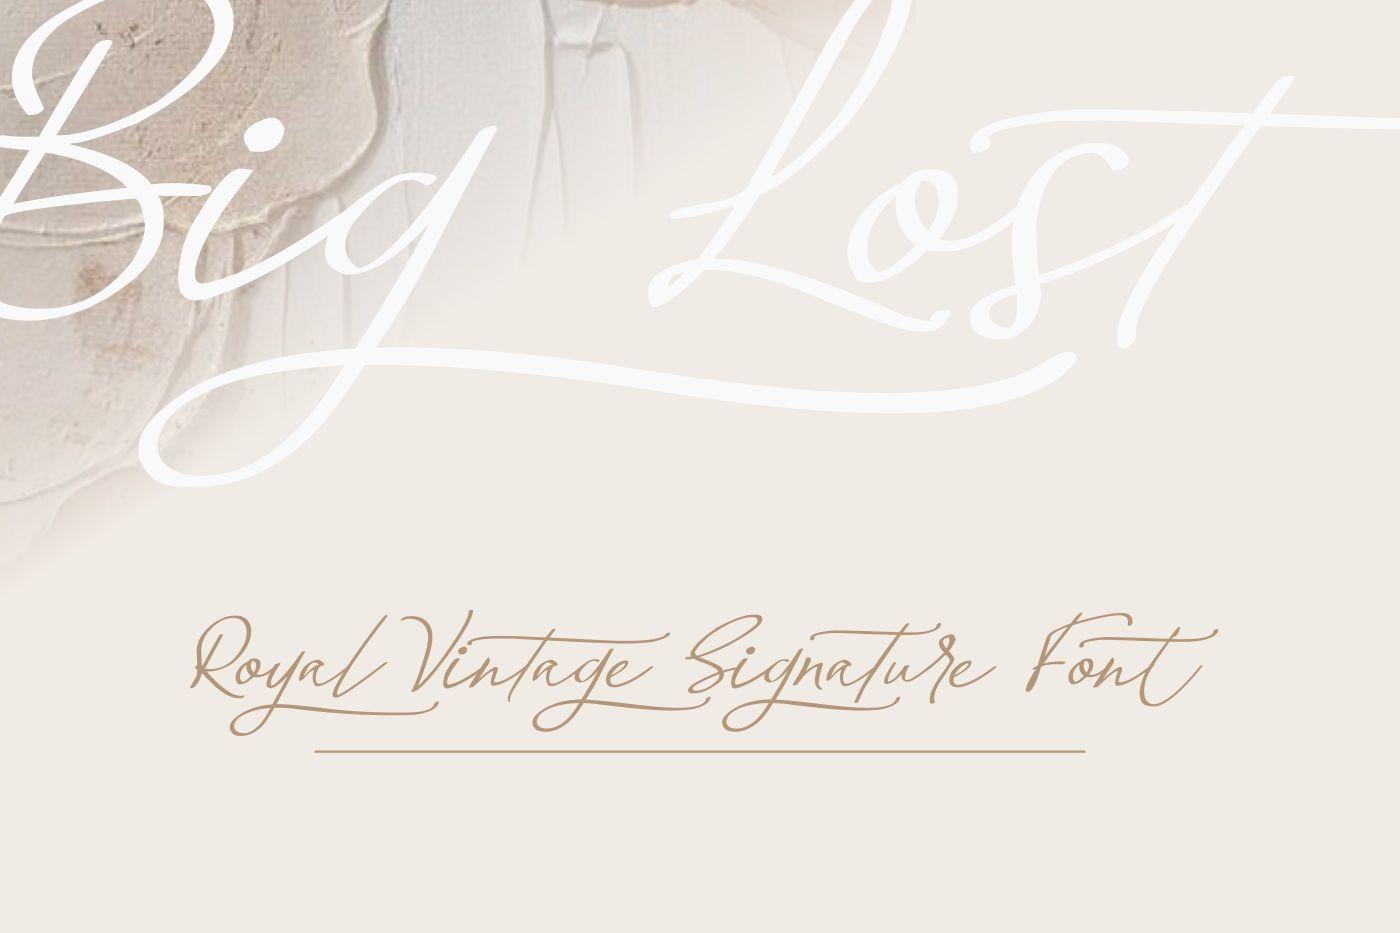 Big-Lost-Royal-Vintage-Signature-Font-3